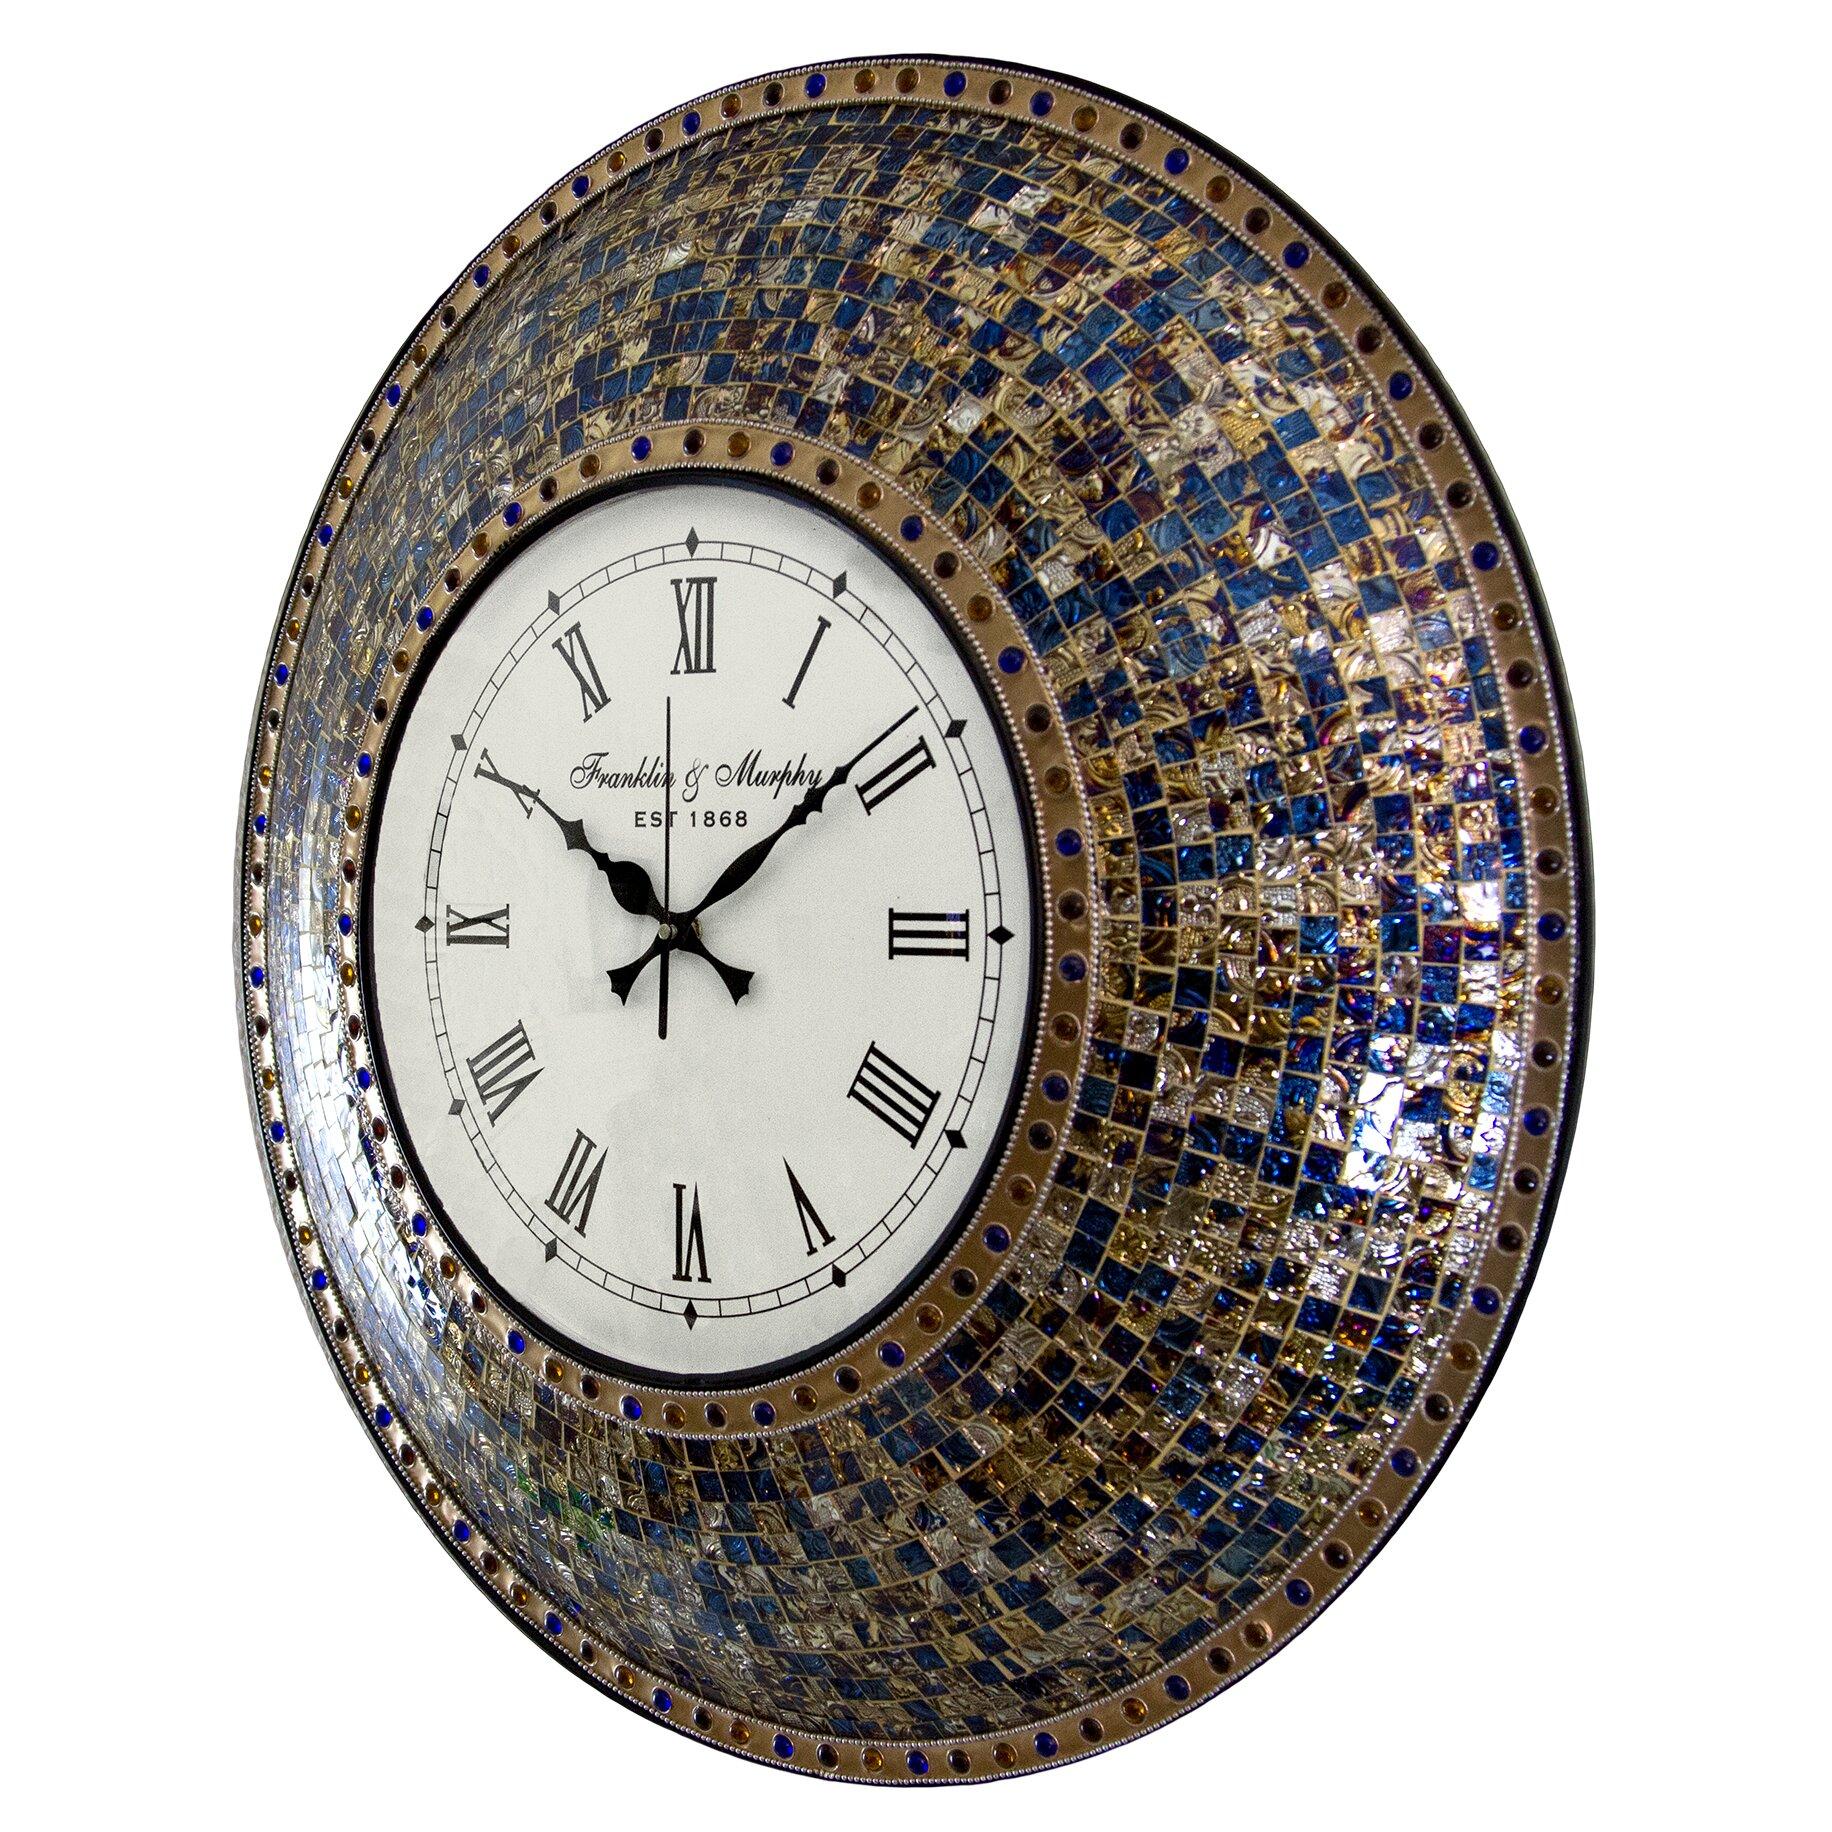 Luca Charcoal 40cm SILENT Wall Clock |Silent Wall Clock